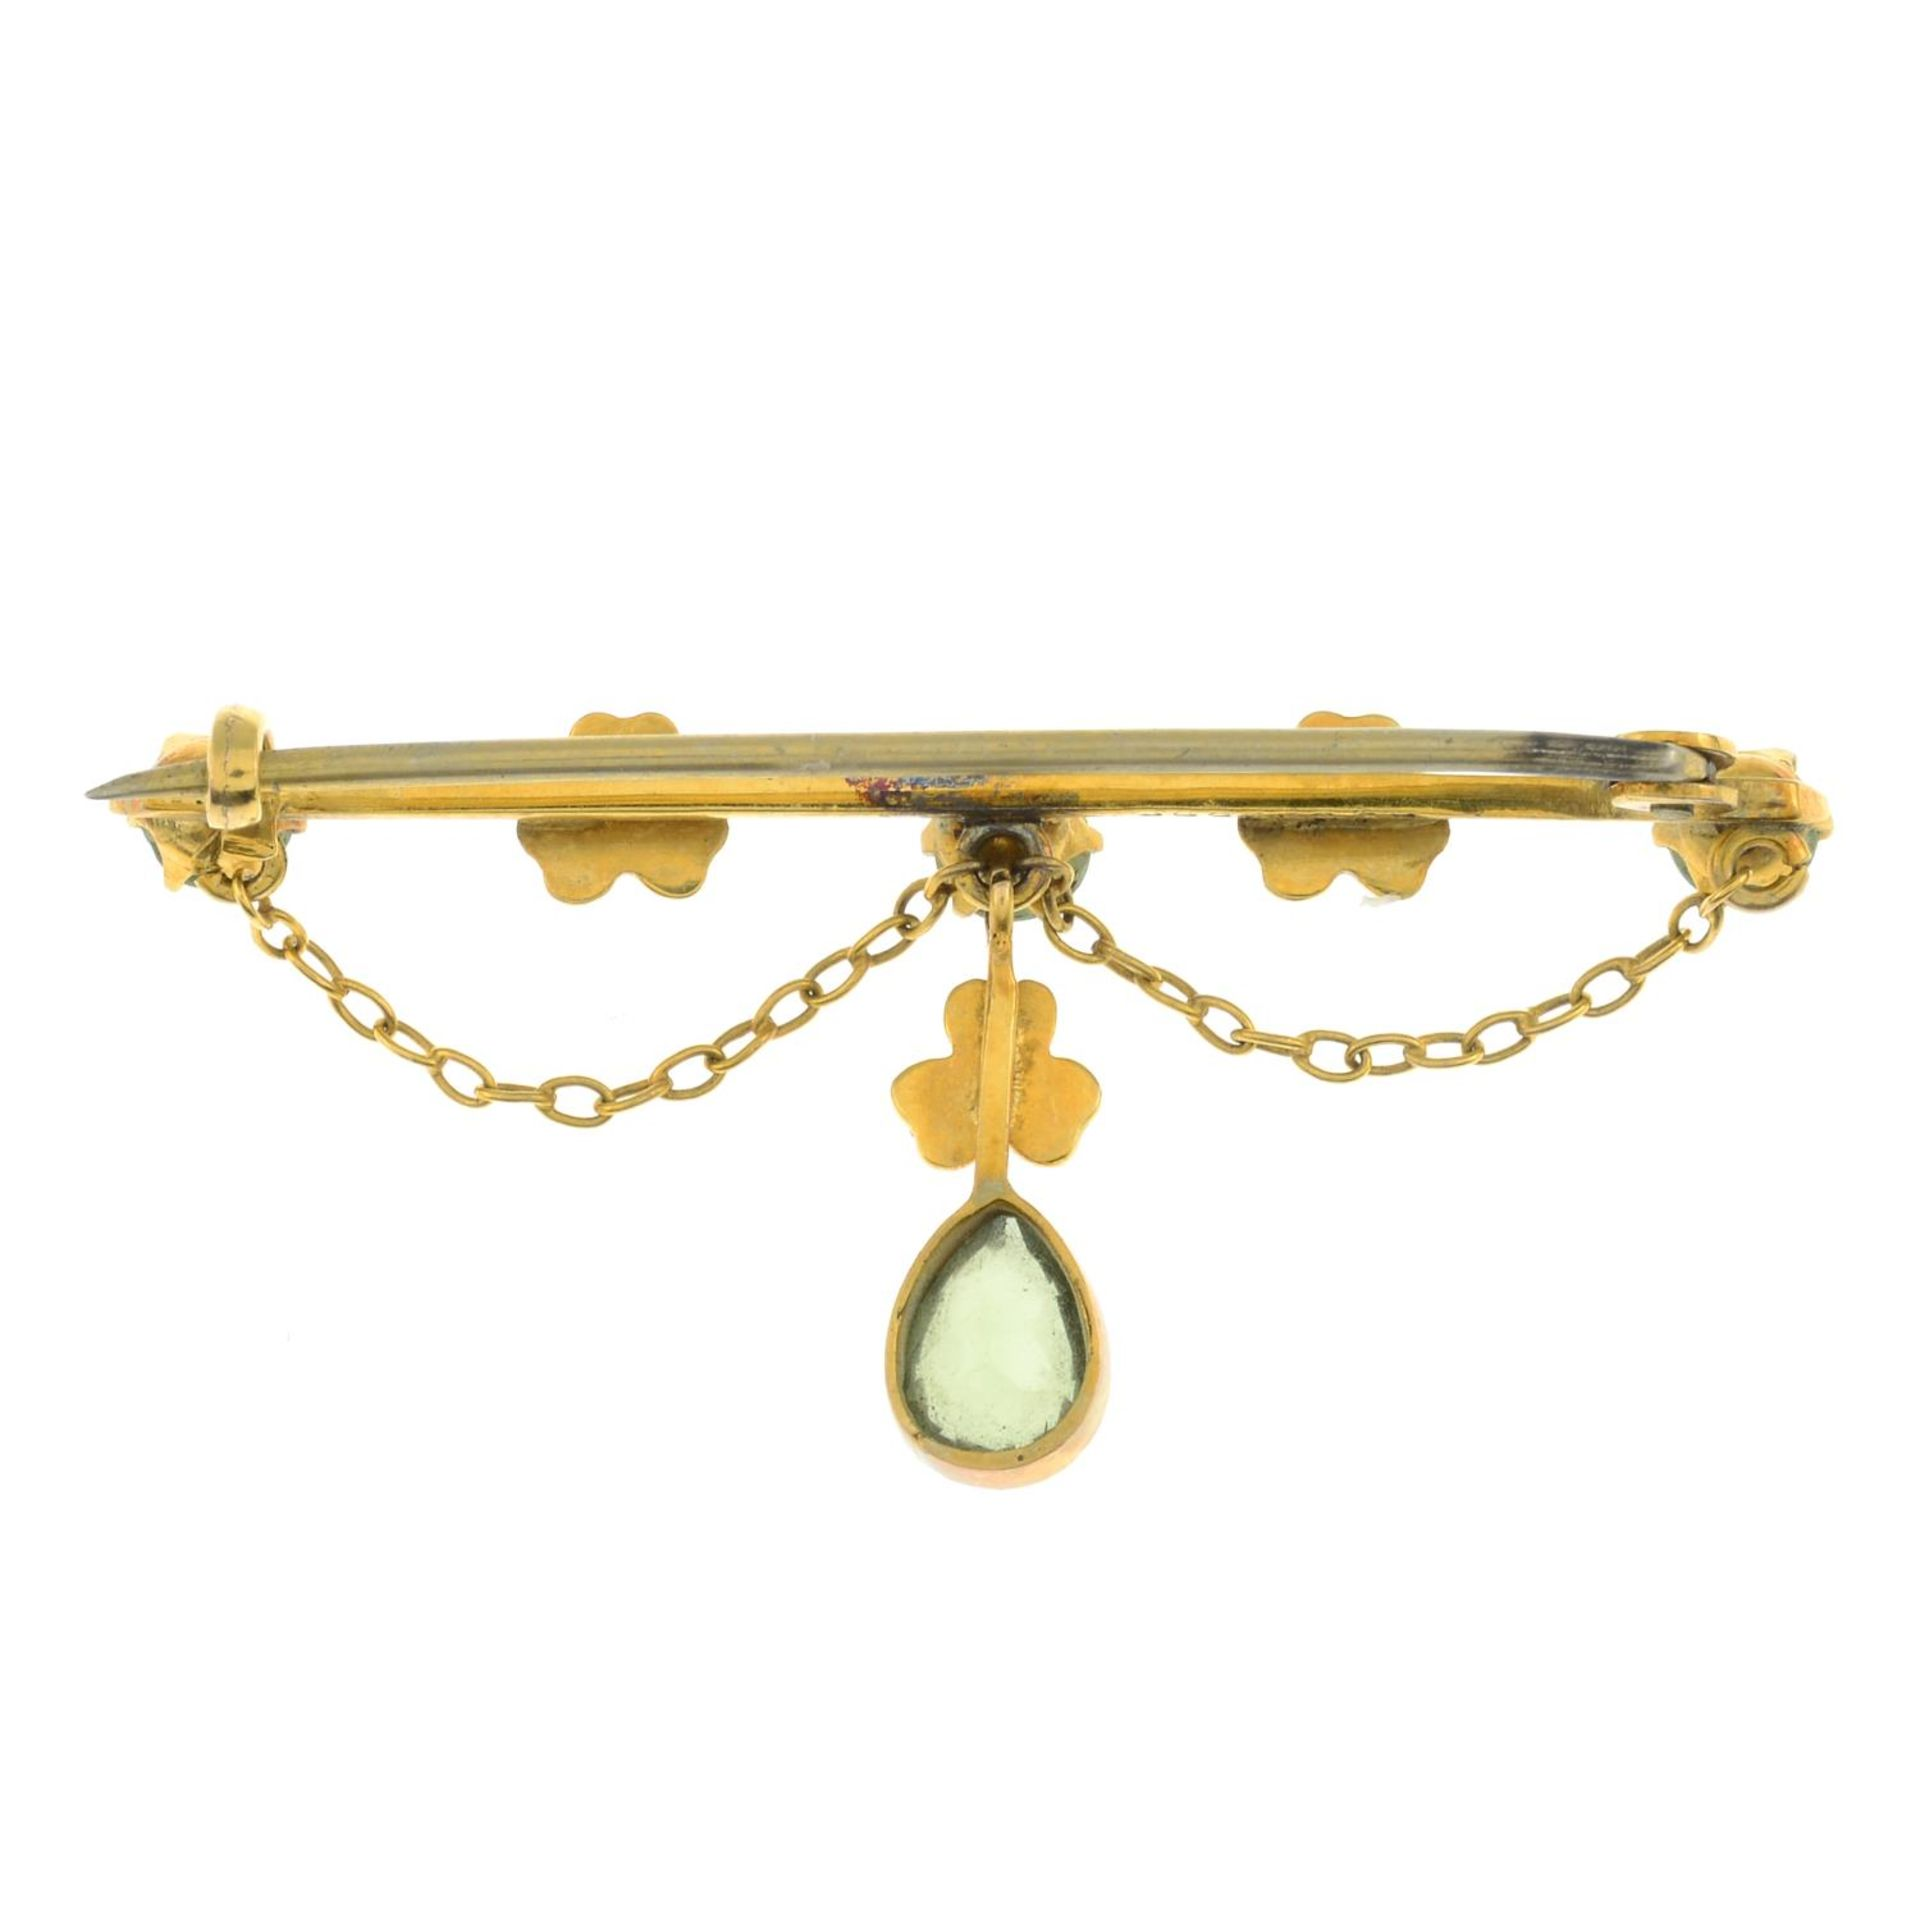 An Edwardian peridot and split pearl brooch. - Image 2 of 3